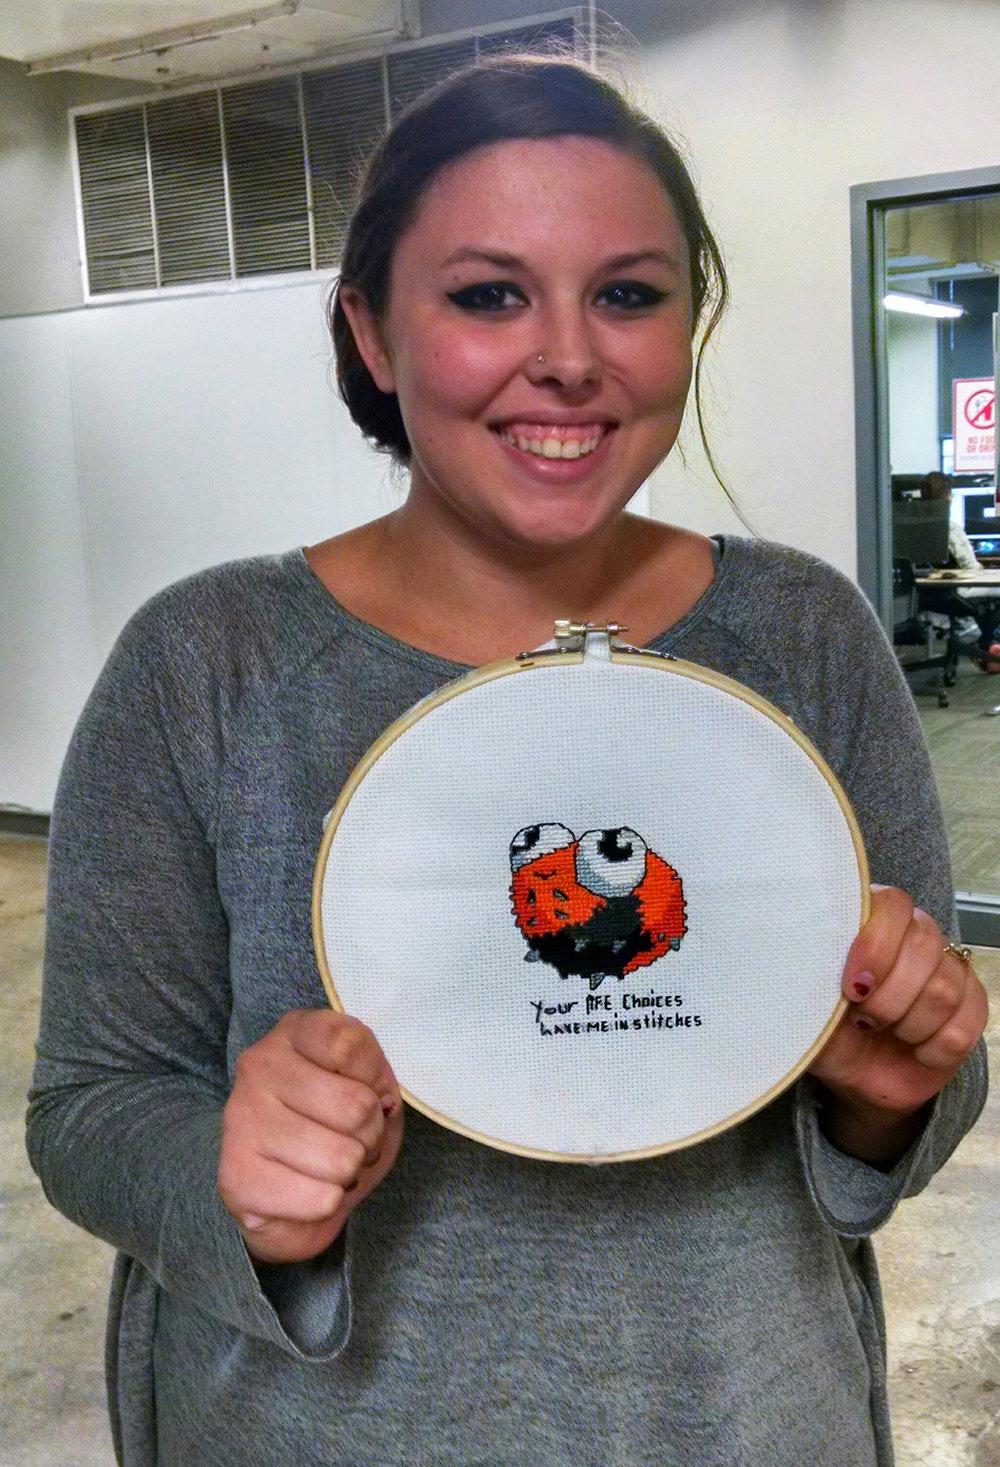 Sam Szutkowski's Wendell Embroidery